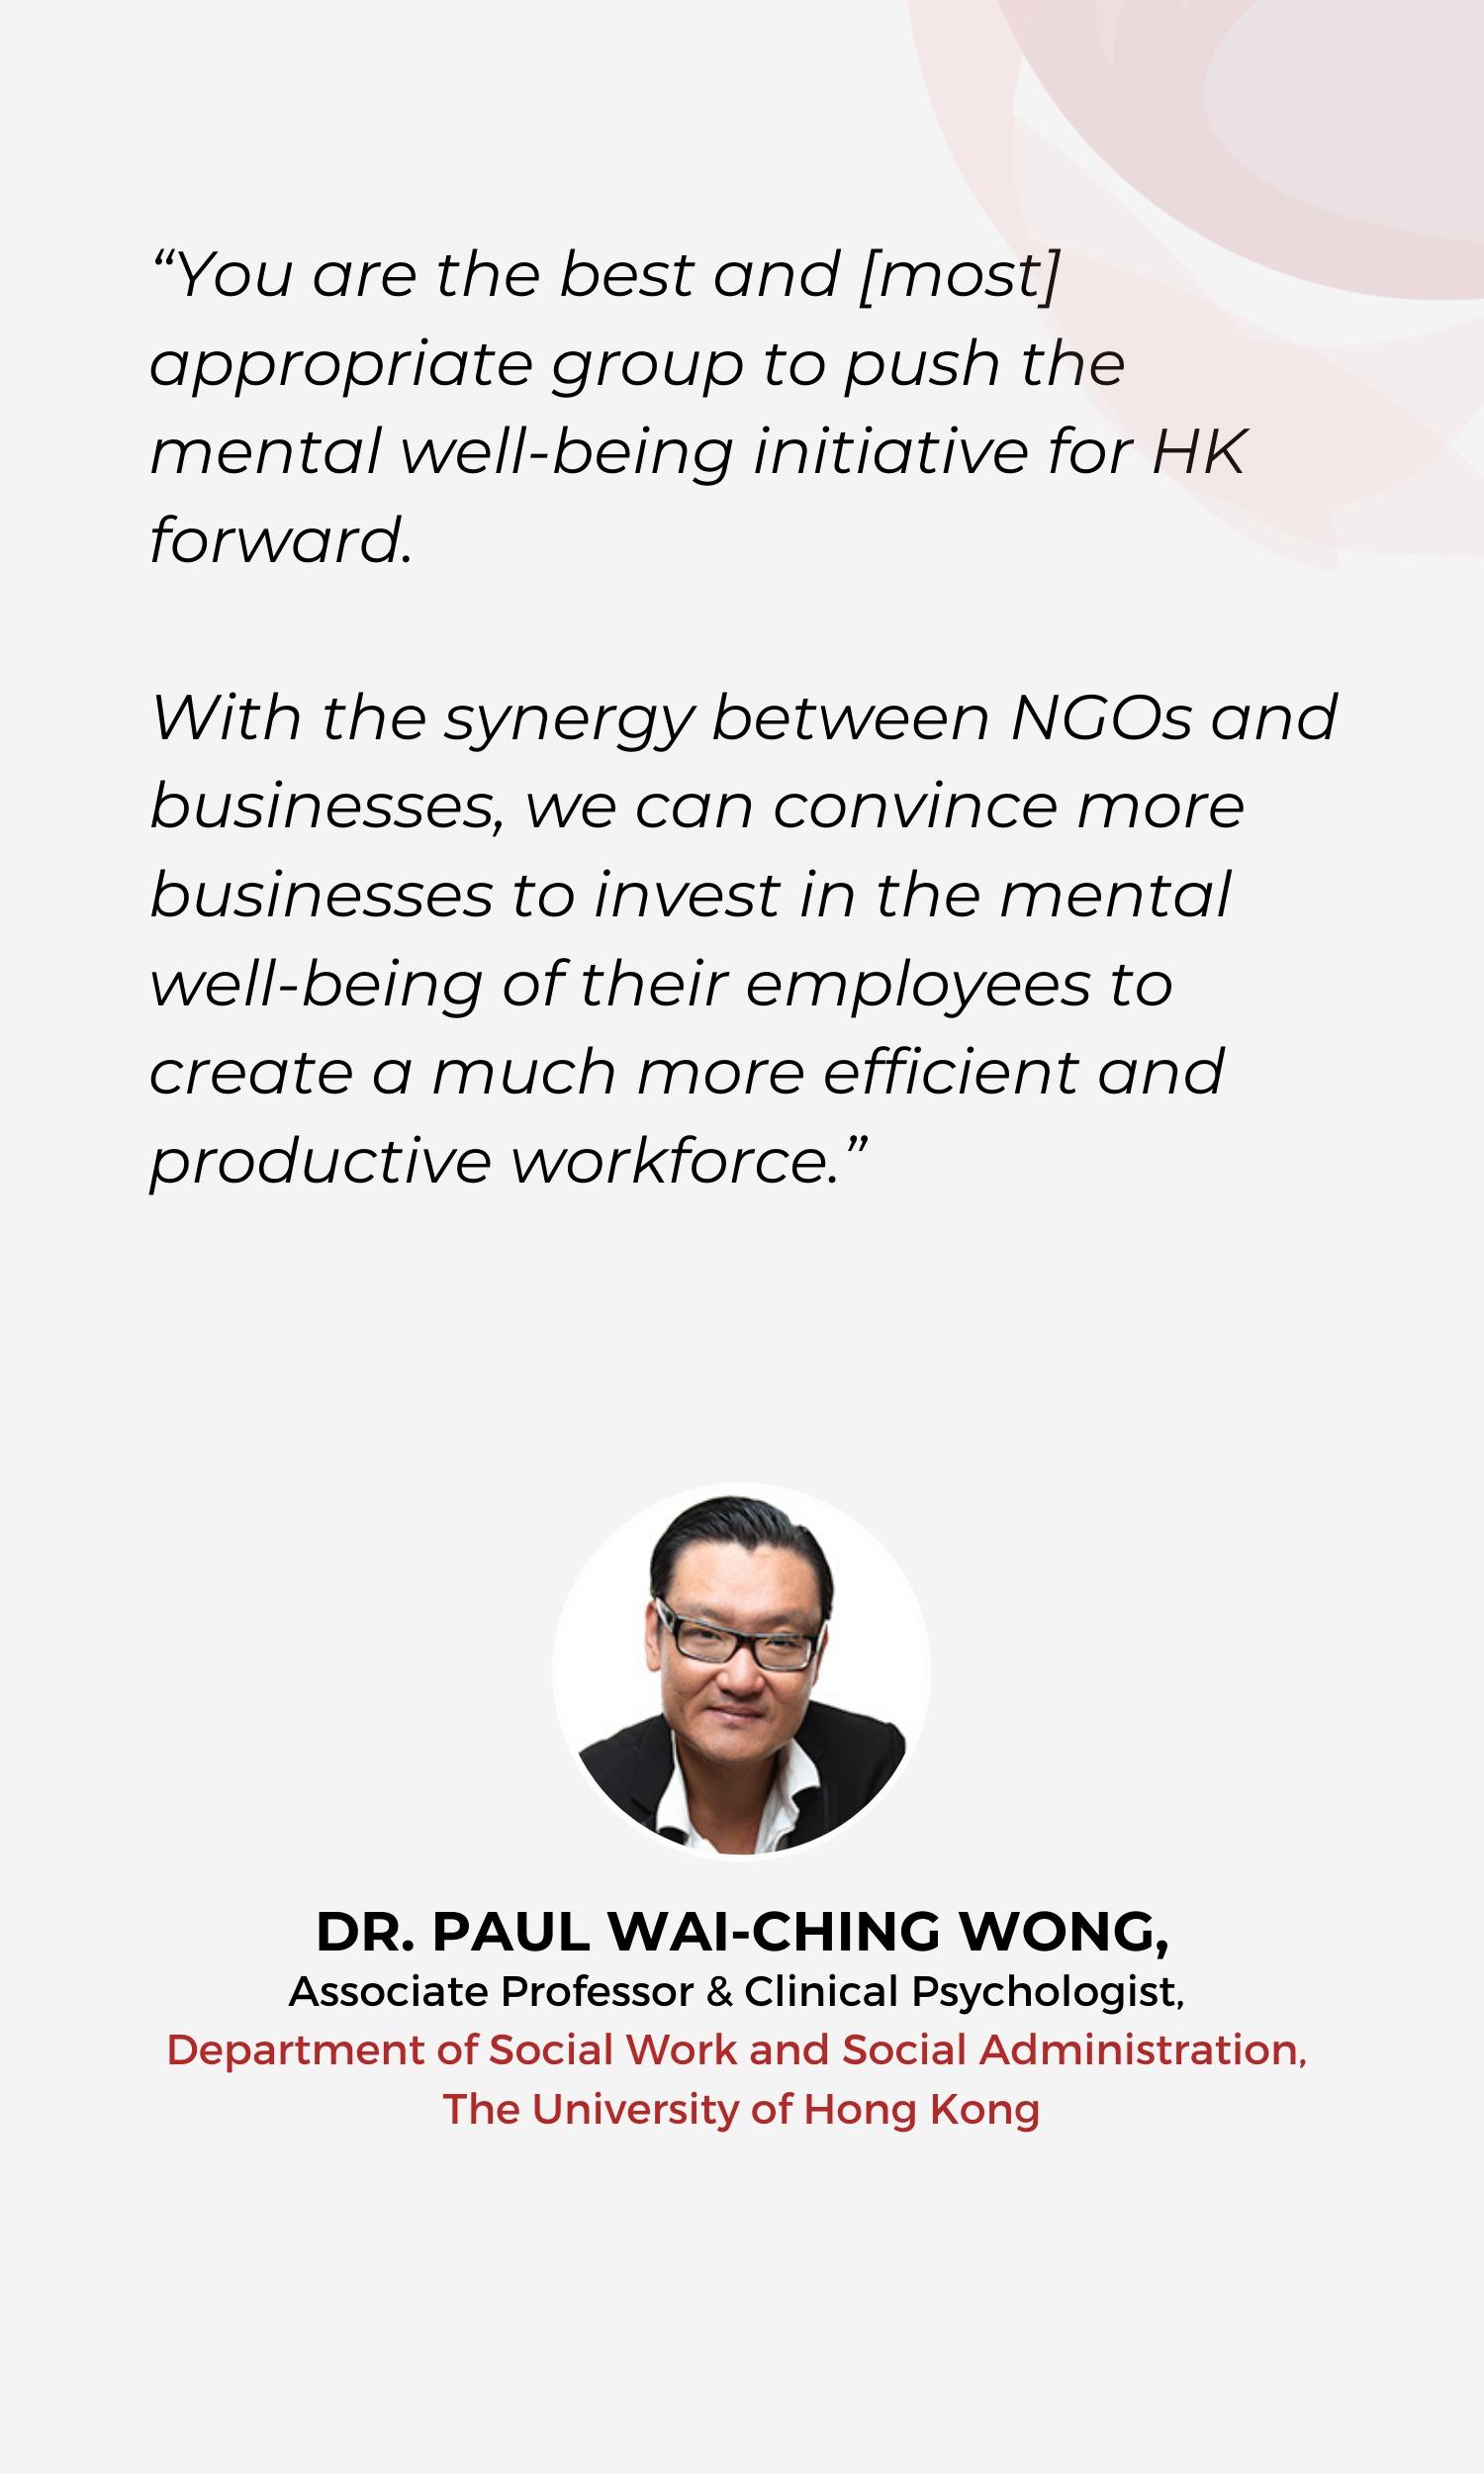 DR. PAUL WAI-CHING WONG Testimoniall